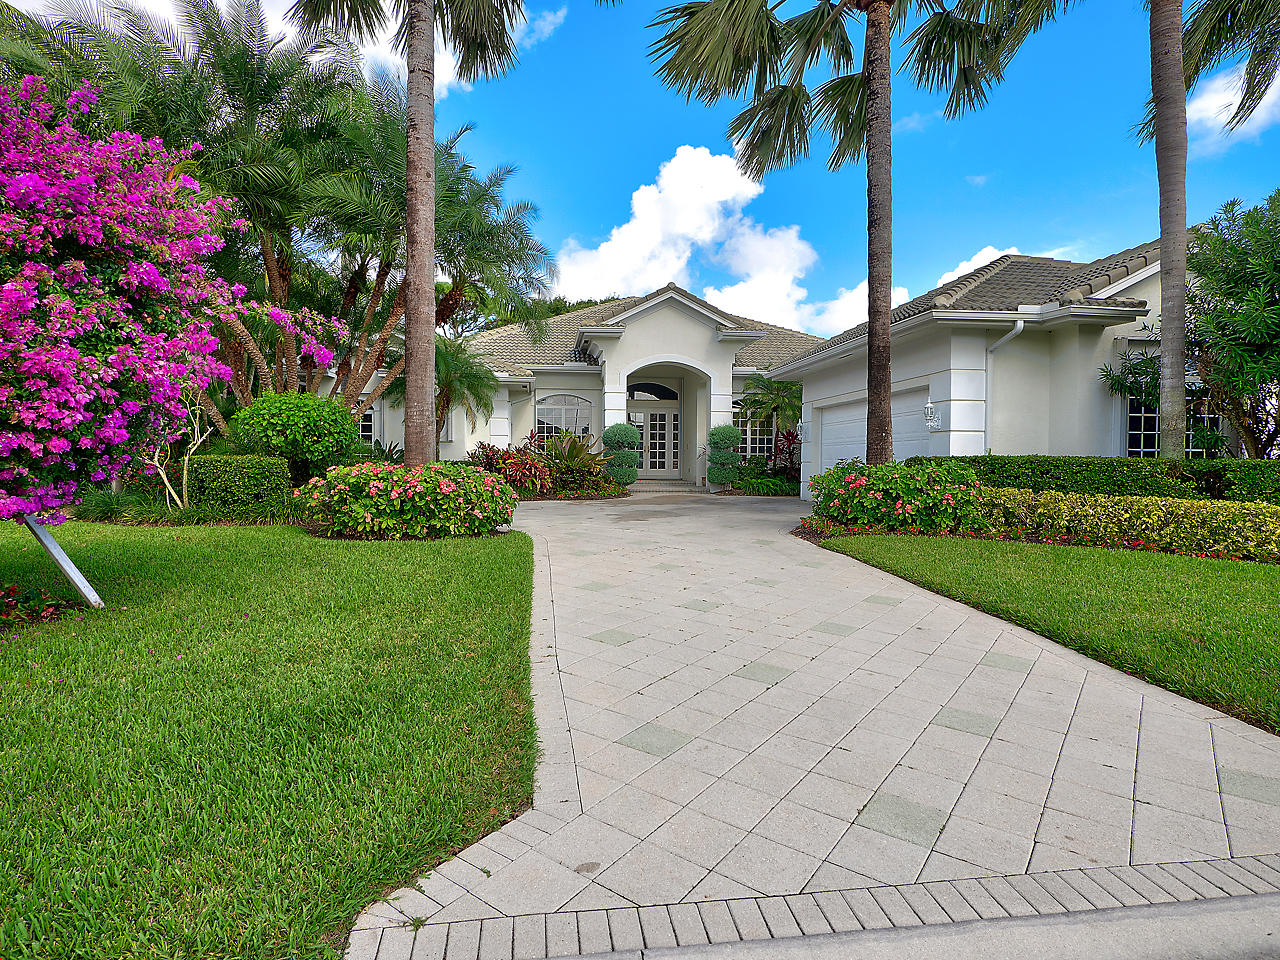 112 Pembroke Drive, Palm Beach Gardens, Florida 33418, 3 Bedrooms Bedrooms, ,3 BathroomsBathrooms,A,Single family,Pembroke,RX-10434916